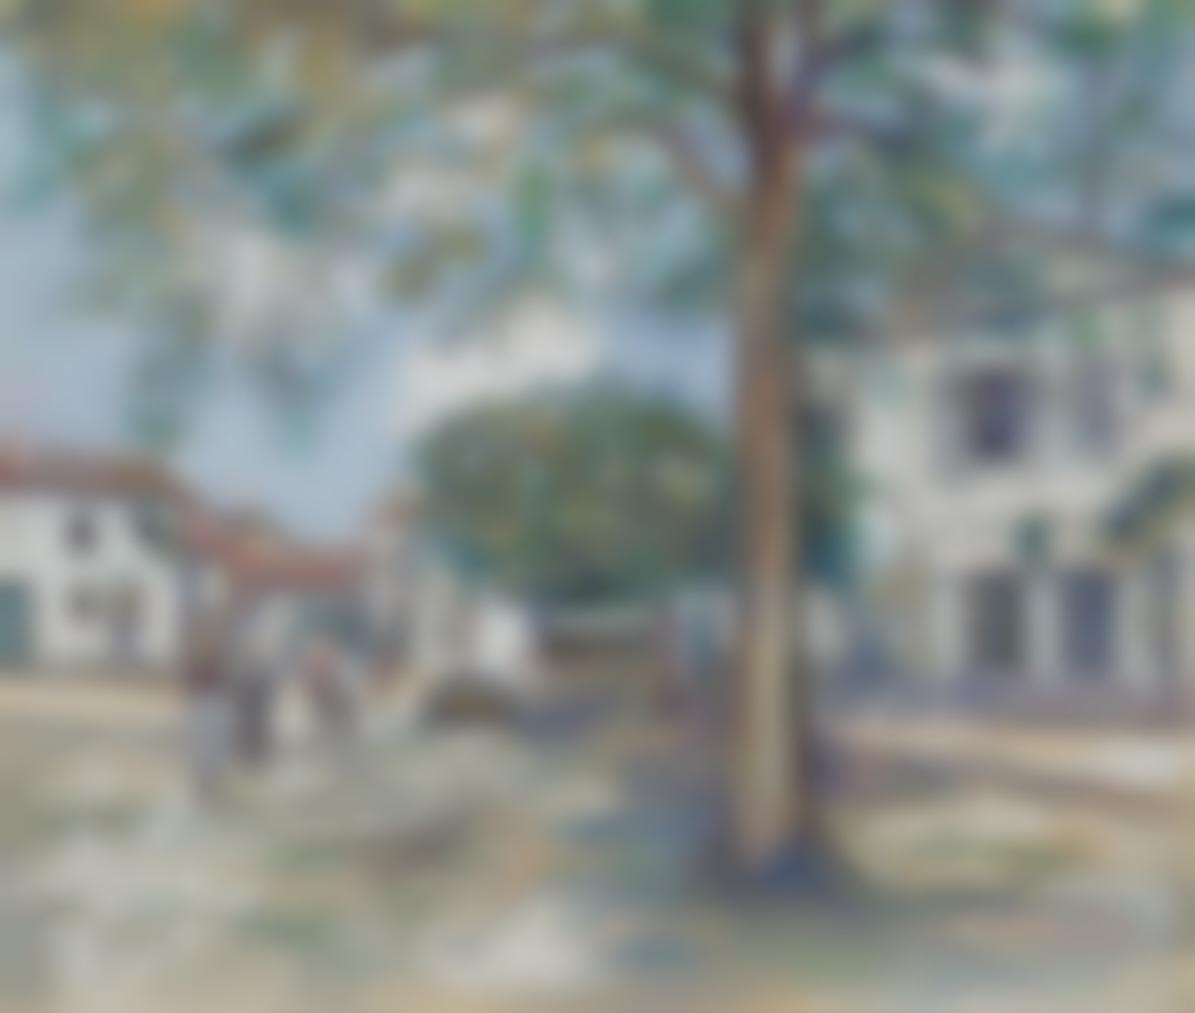 Maurice Utrillo-Saint-Yrieix-Sous-Aixe-1926